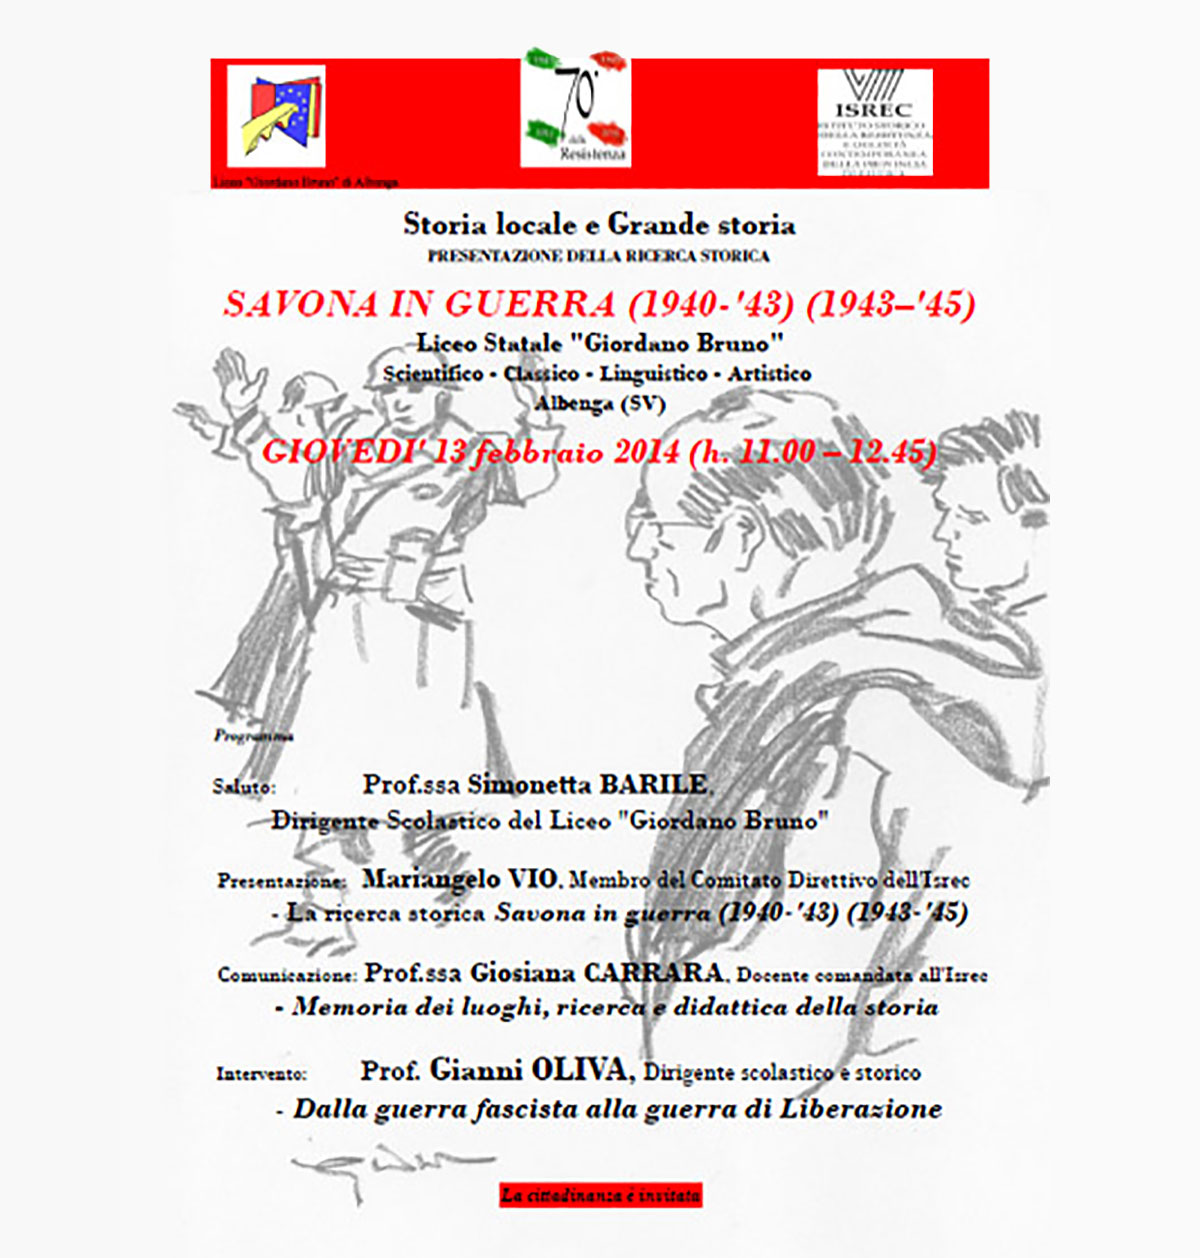 locandina-storia-memoria-della-guerra-albenga